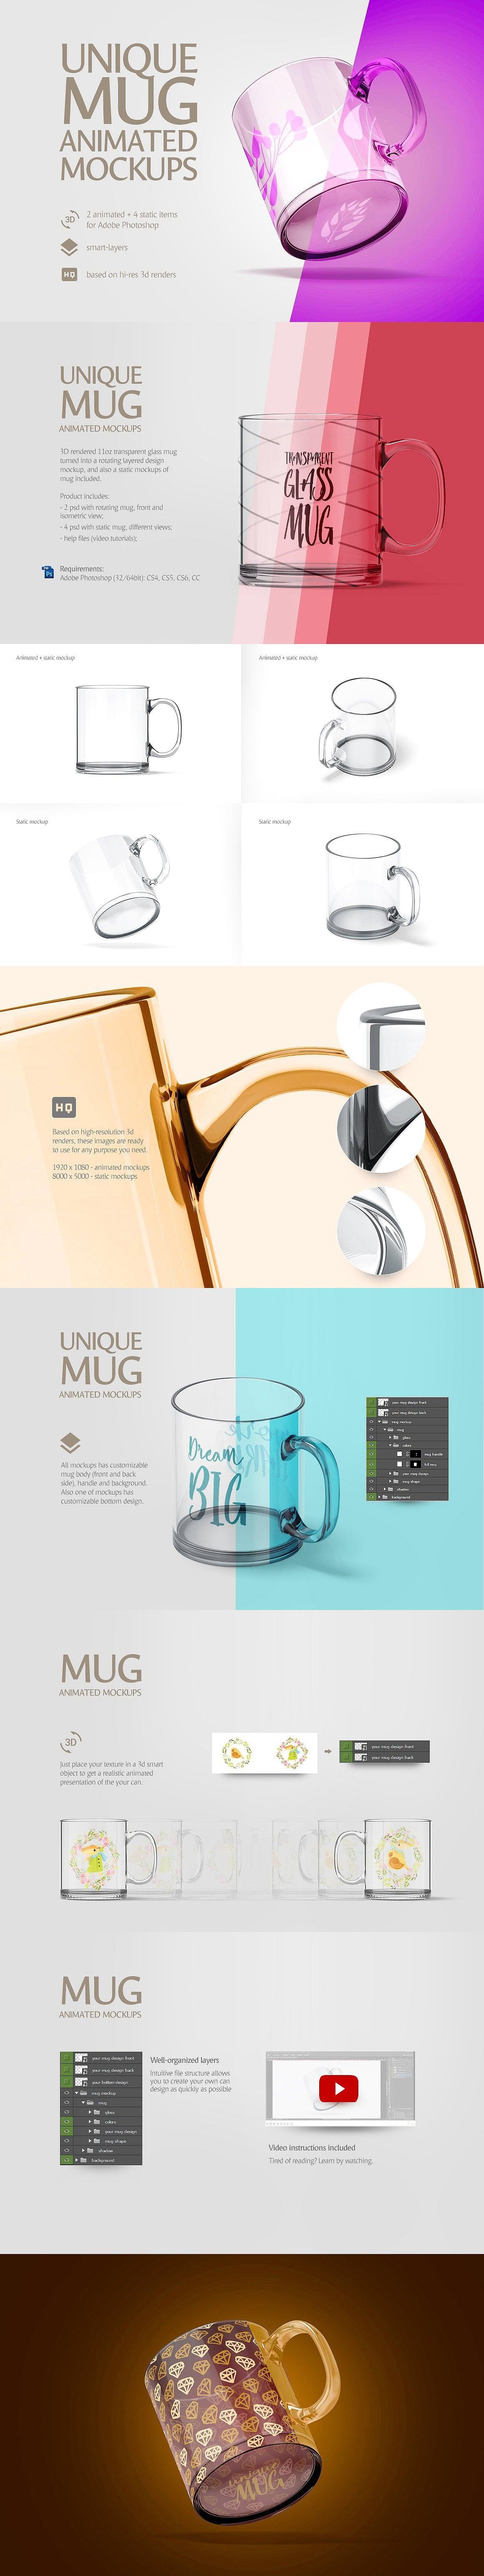 Mug Animated Mockups Bundle